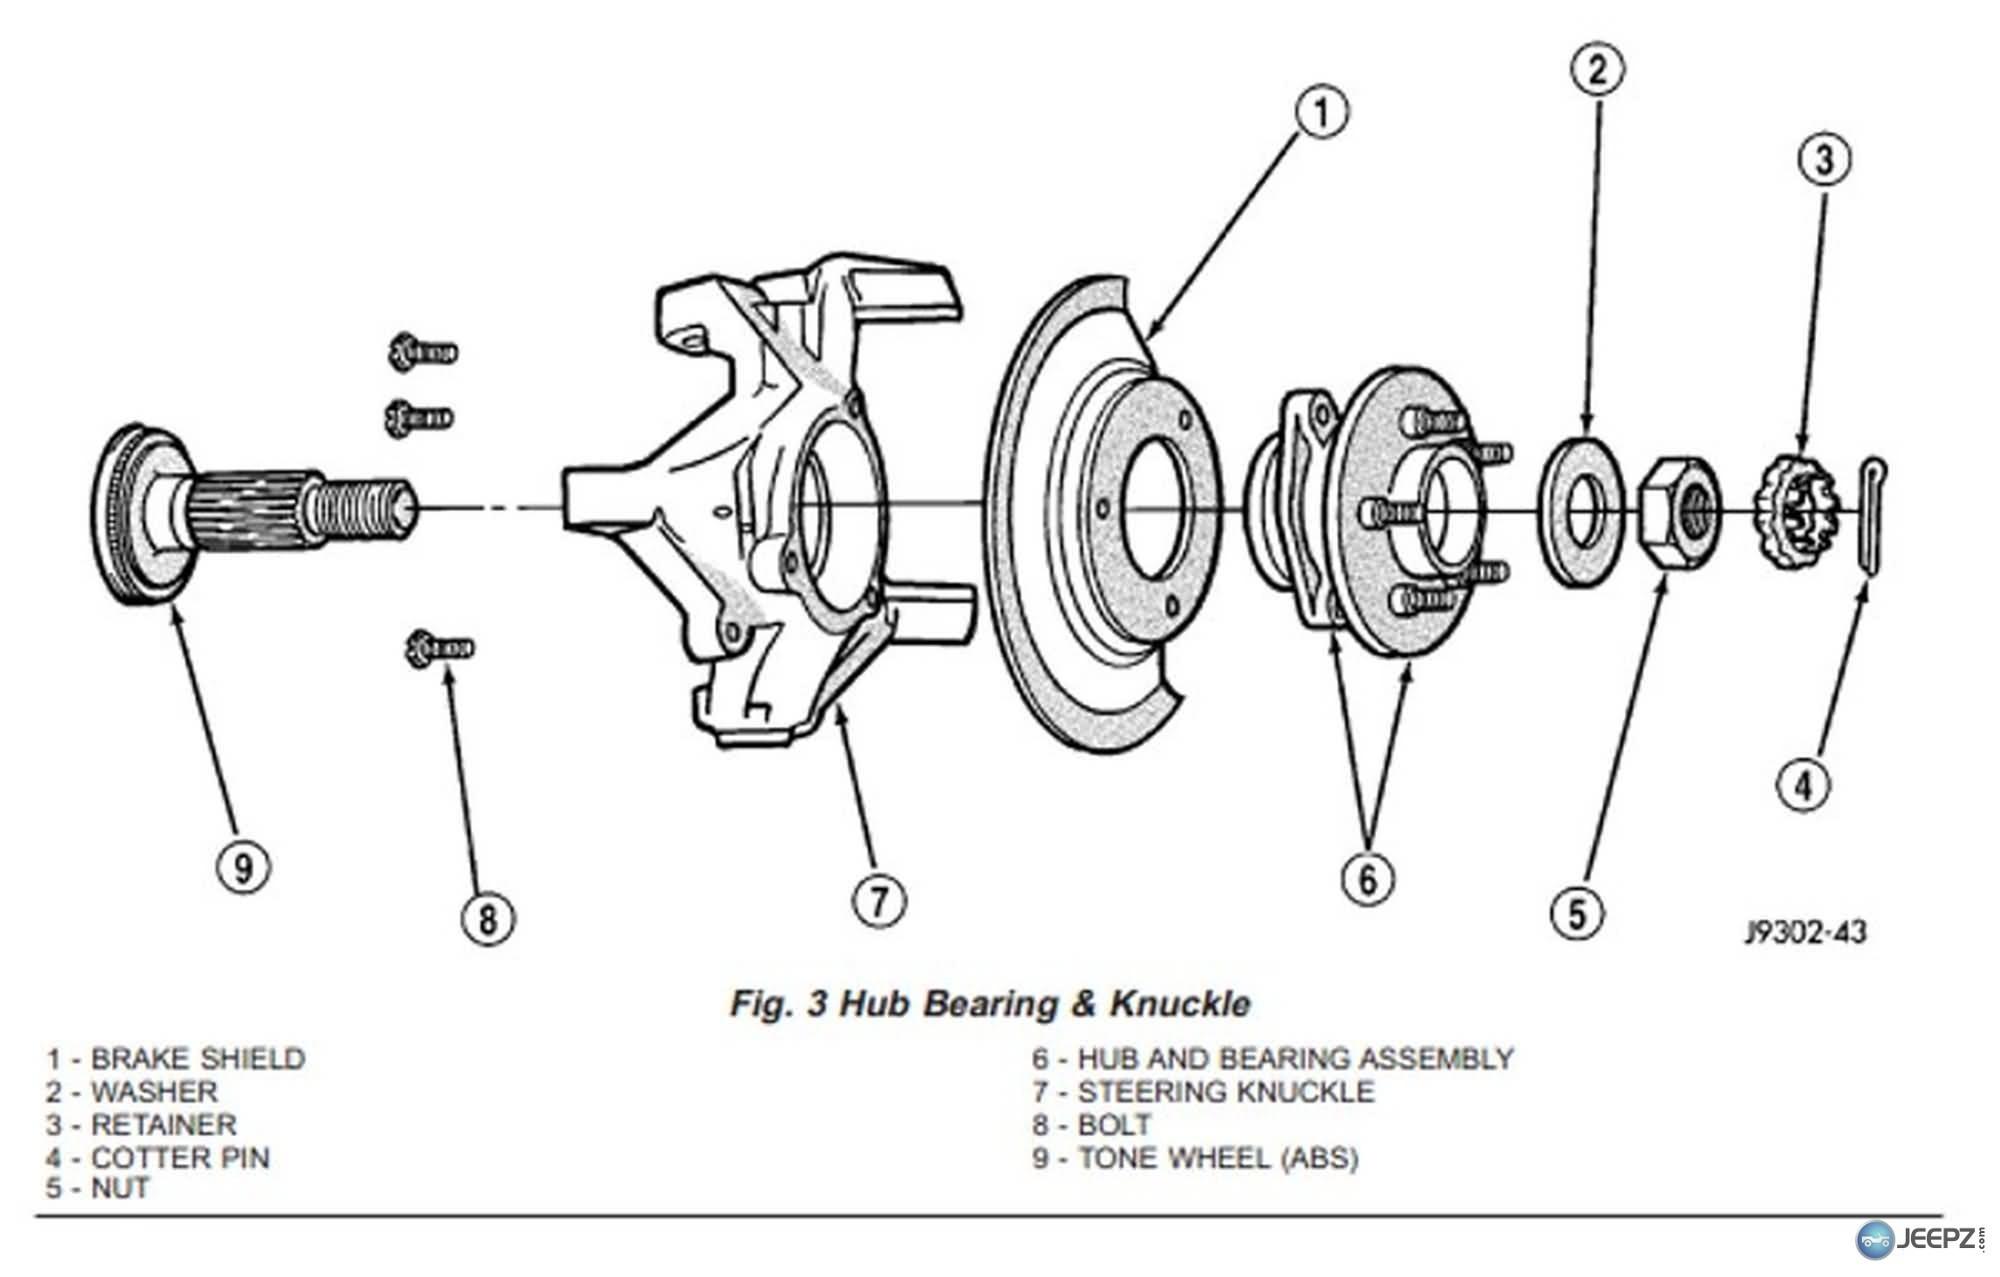 Car Starter Parts Diagram Yamaha G2 Wiring G2a Wheel Bearing Assembly Extraordinary Of